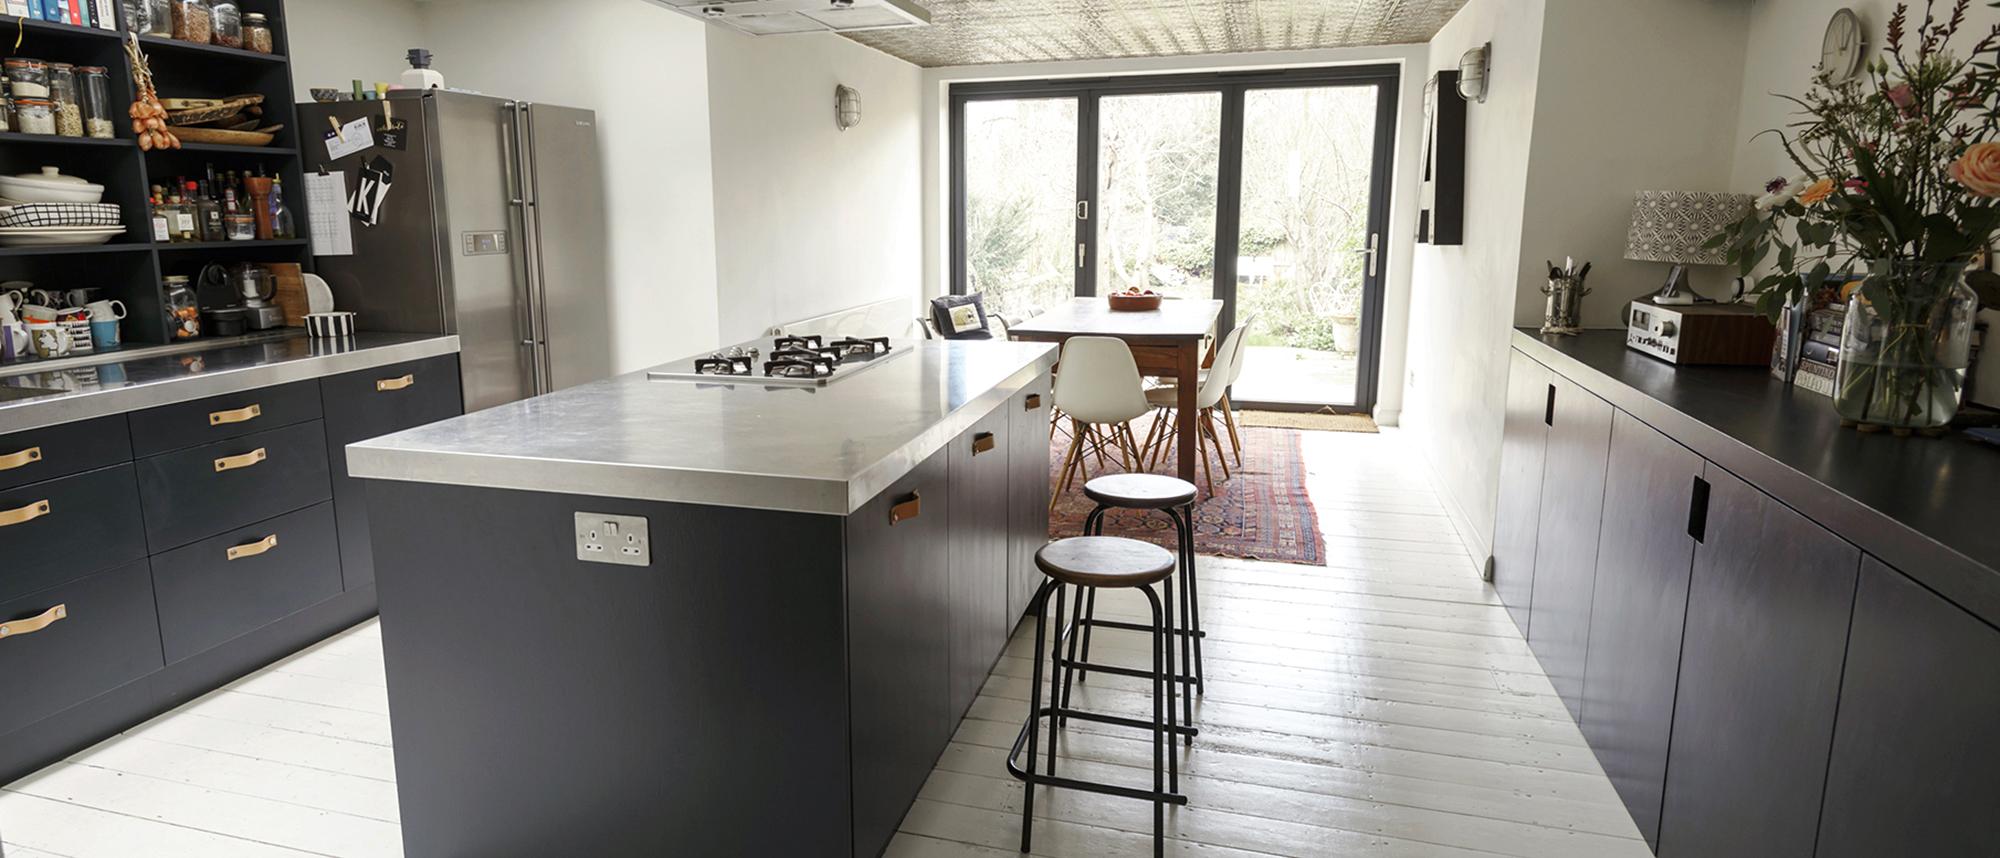 Kate Watson Smyth's home